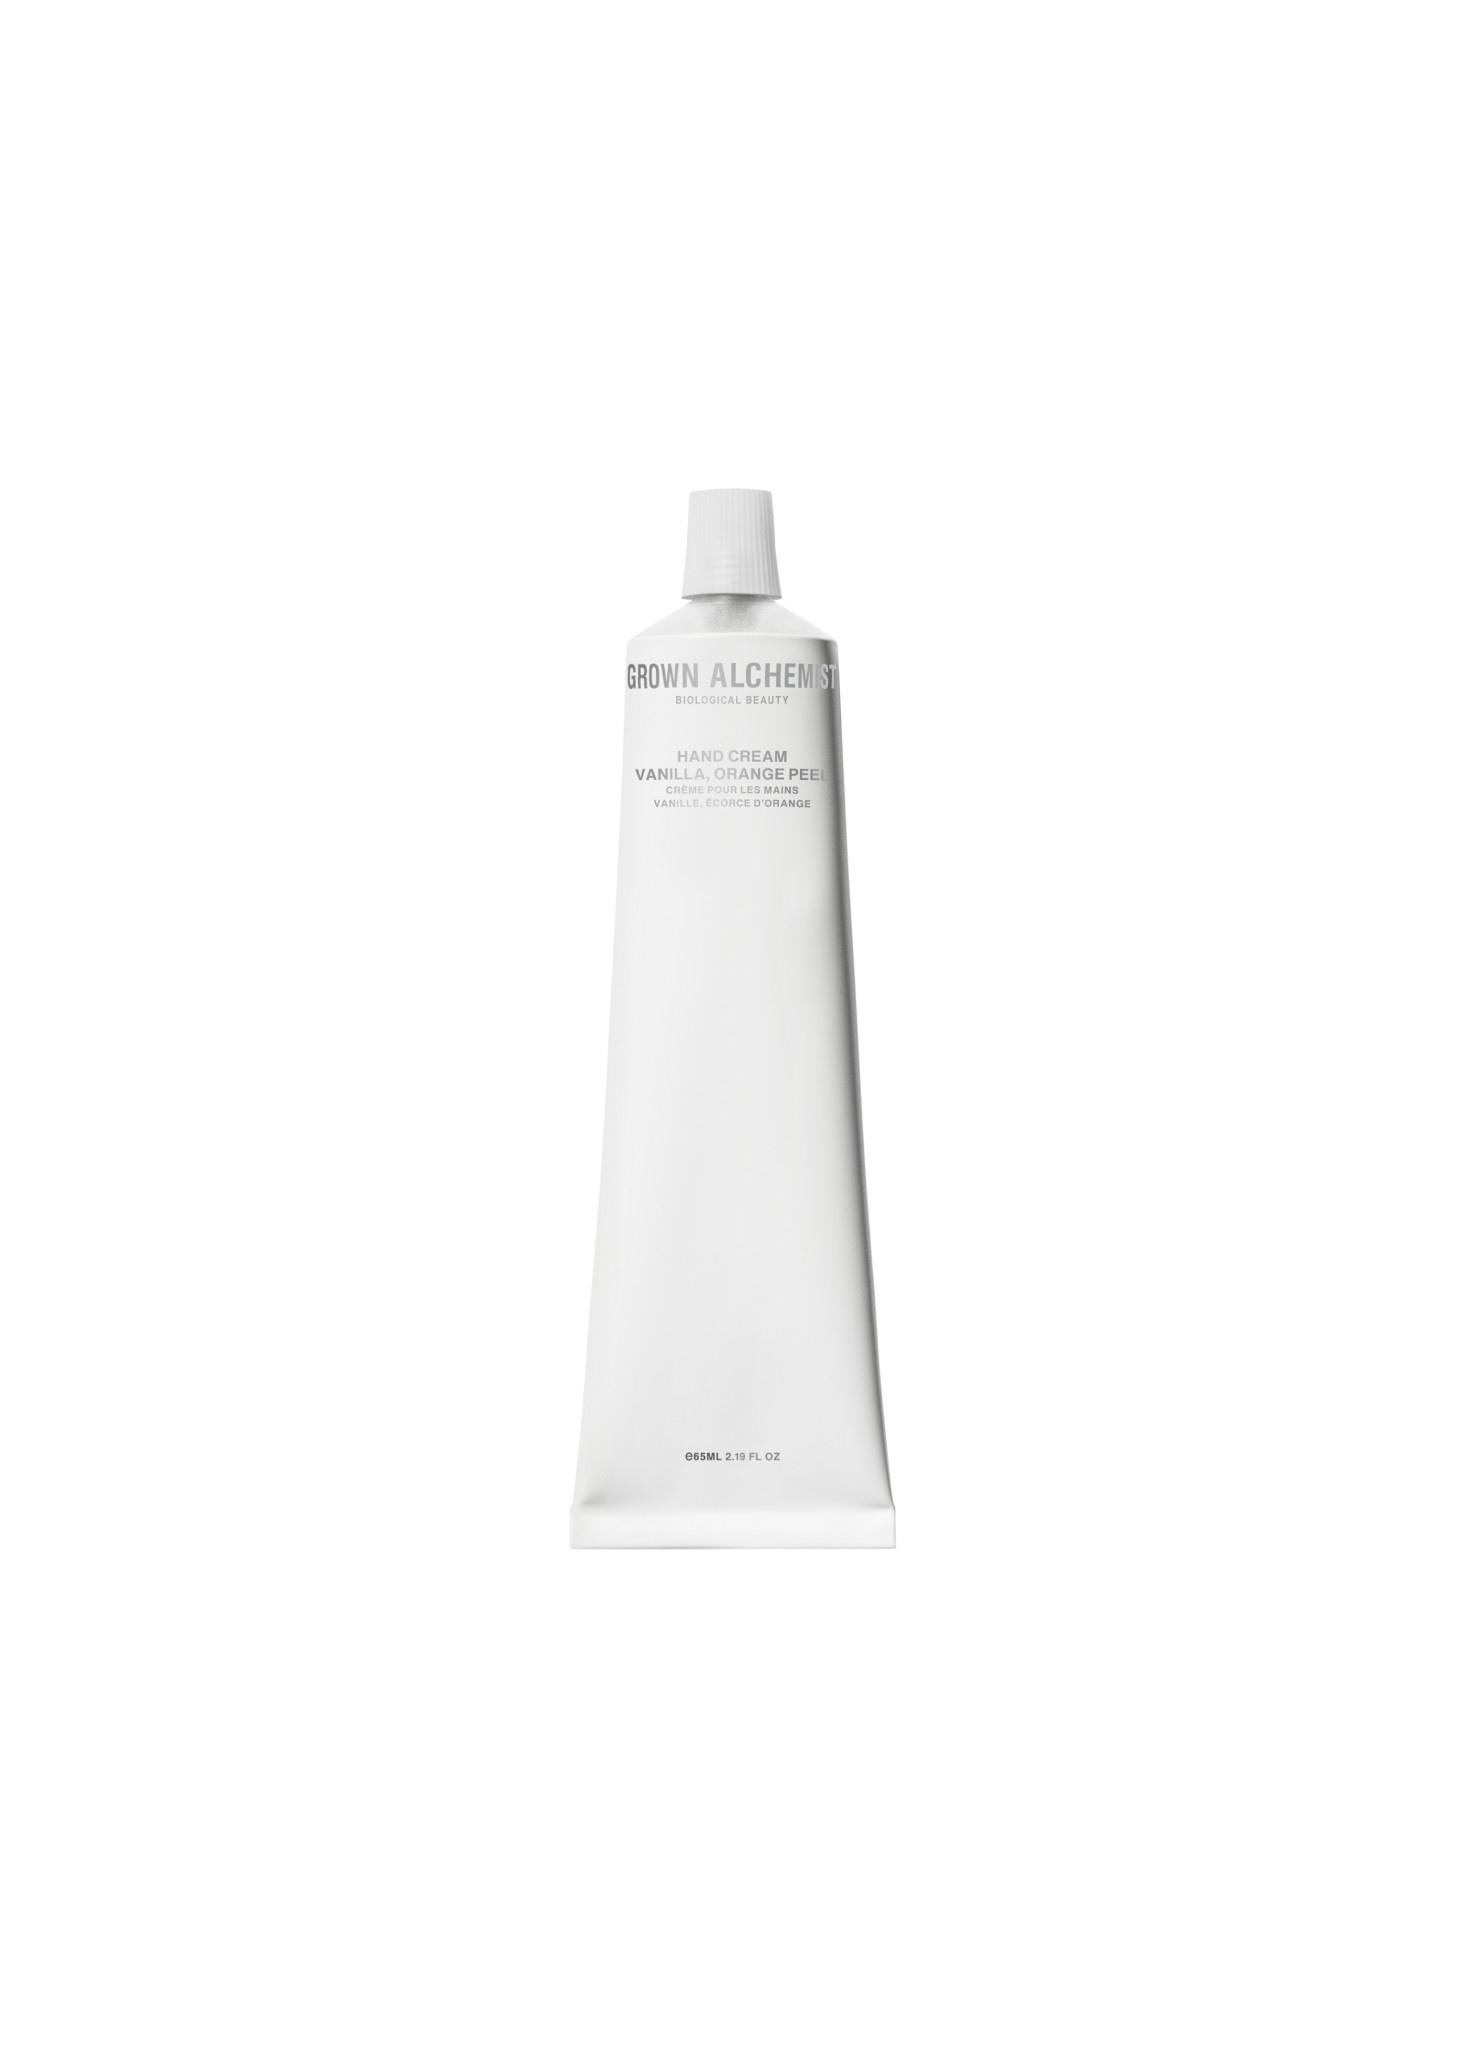 Body cream 120 ml Limited edition-1